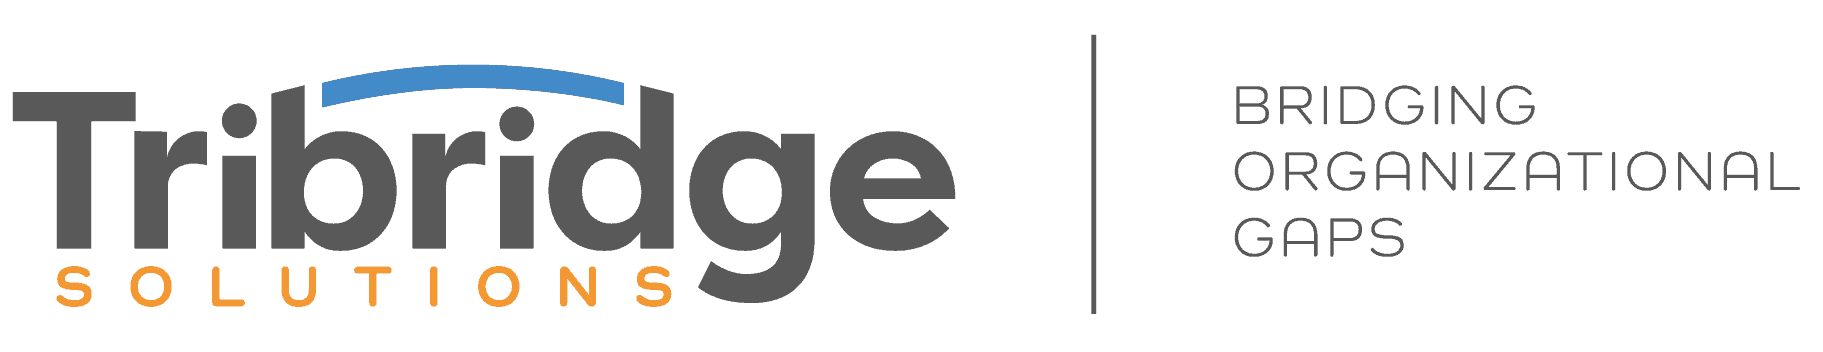 tribridge solutions logo